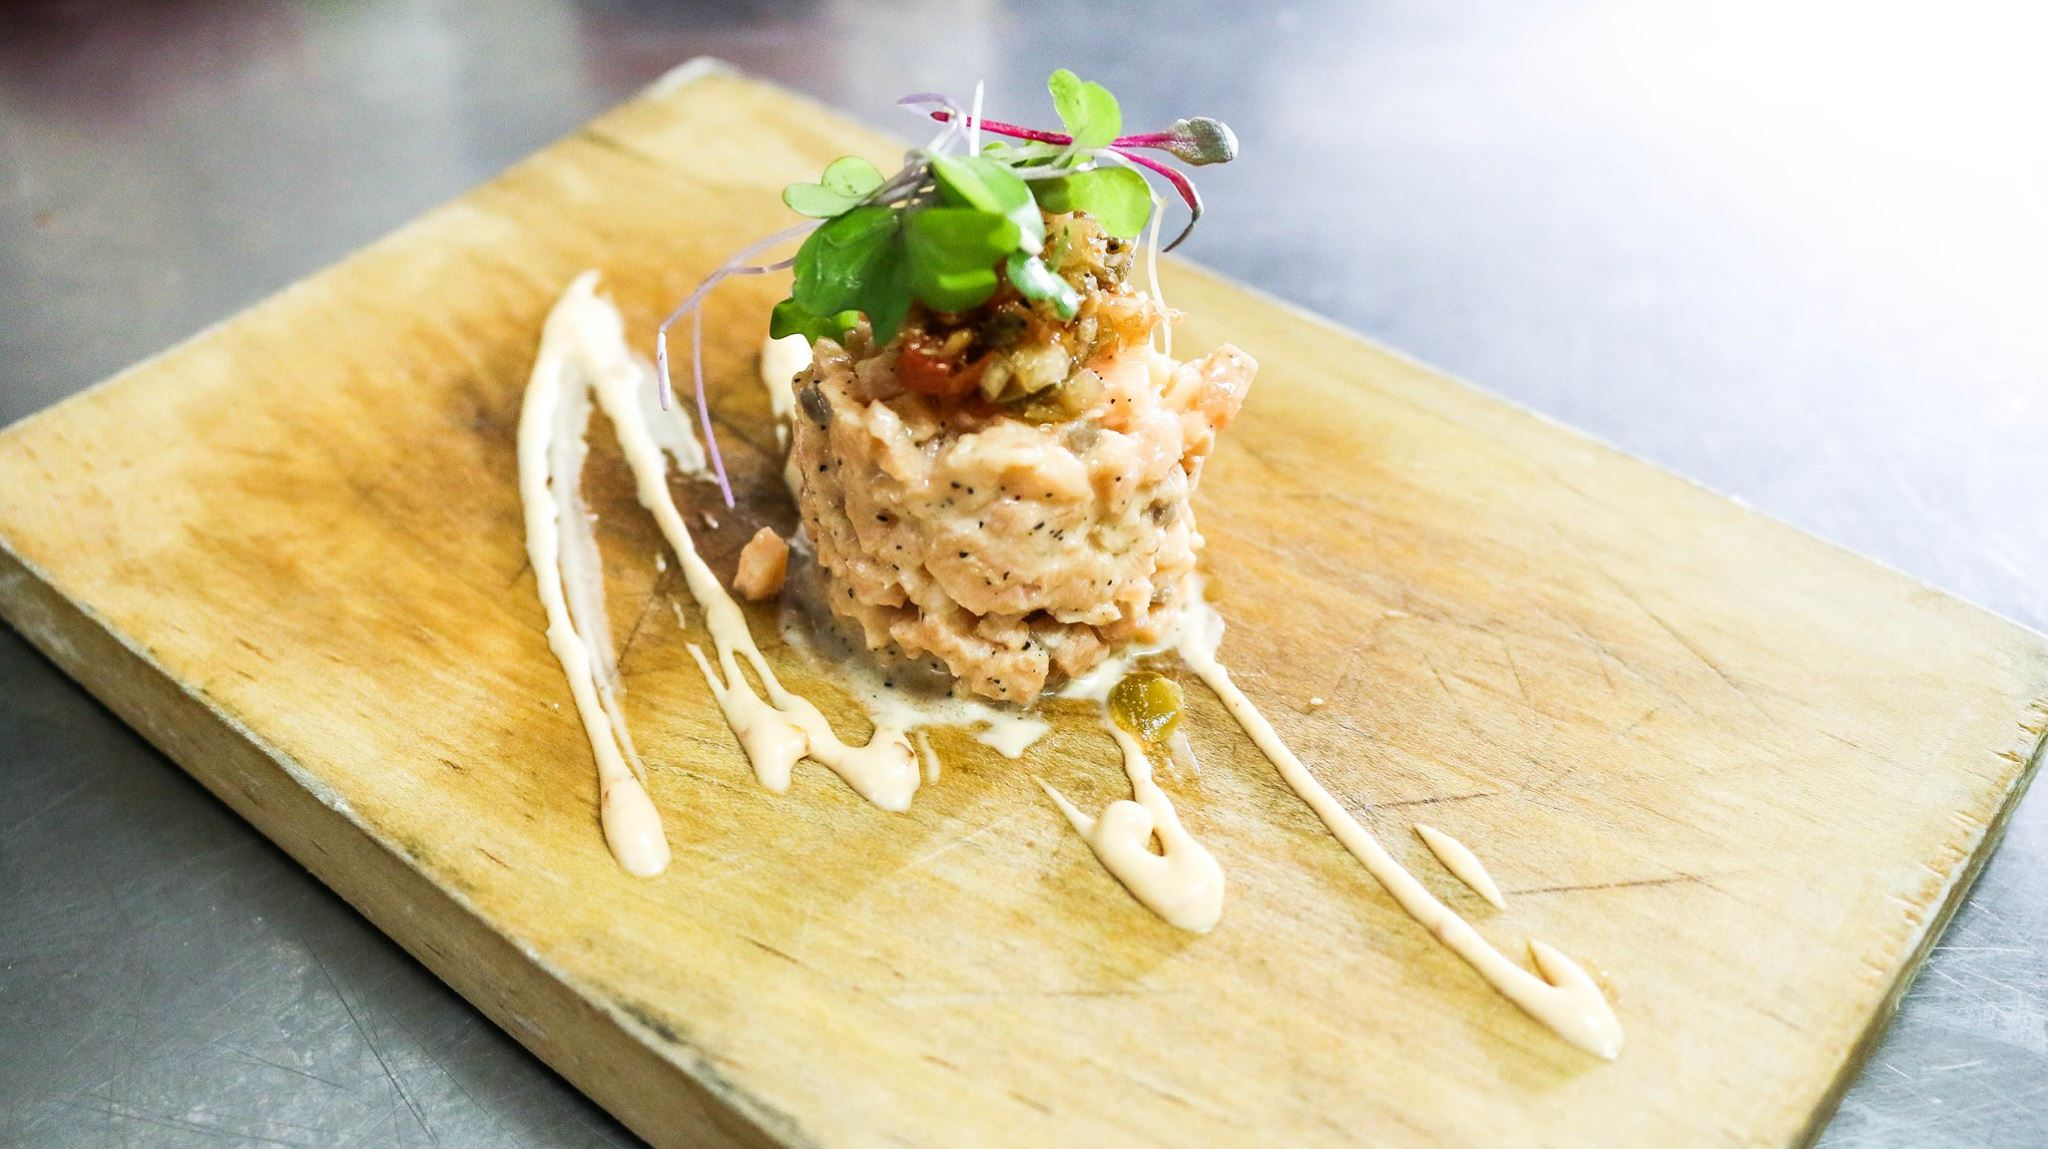 Salmon tartare on a wooden board